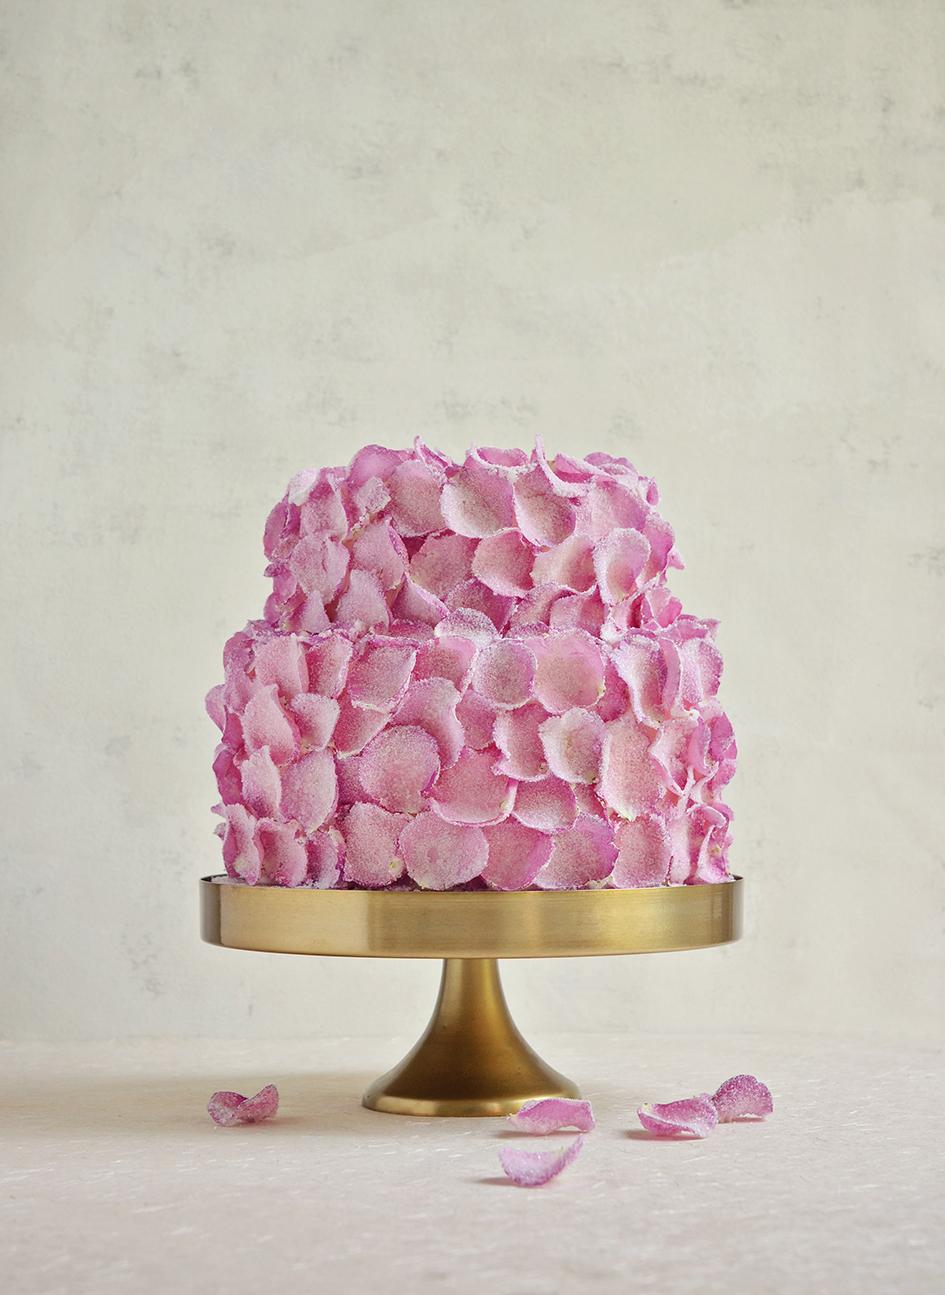 Sugared rose petal cake